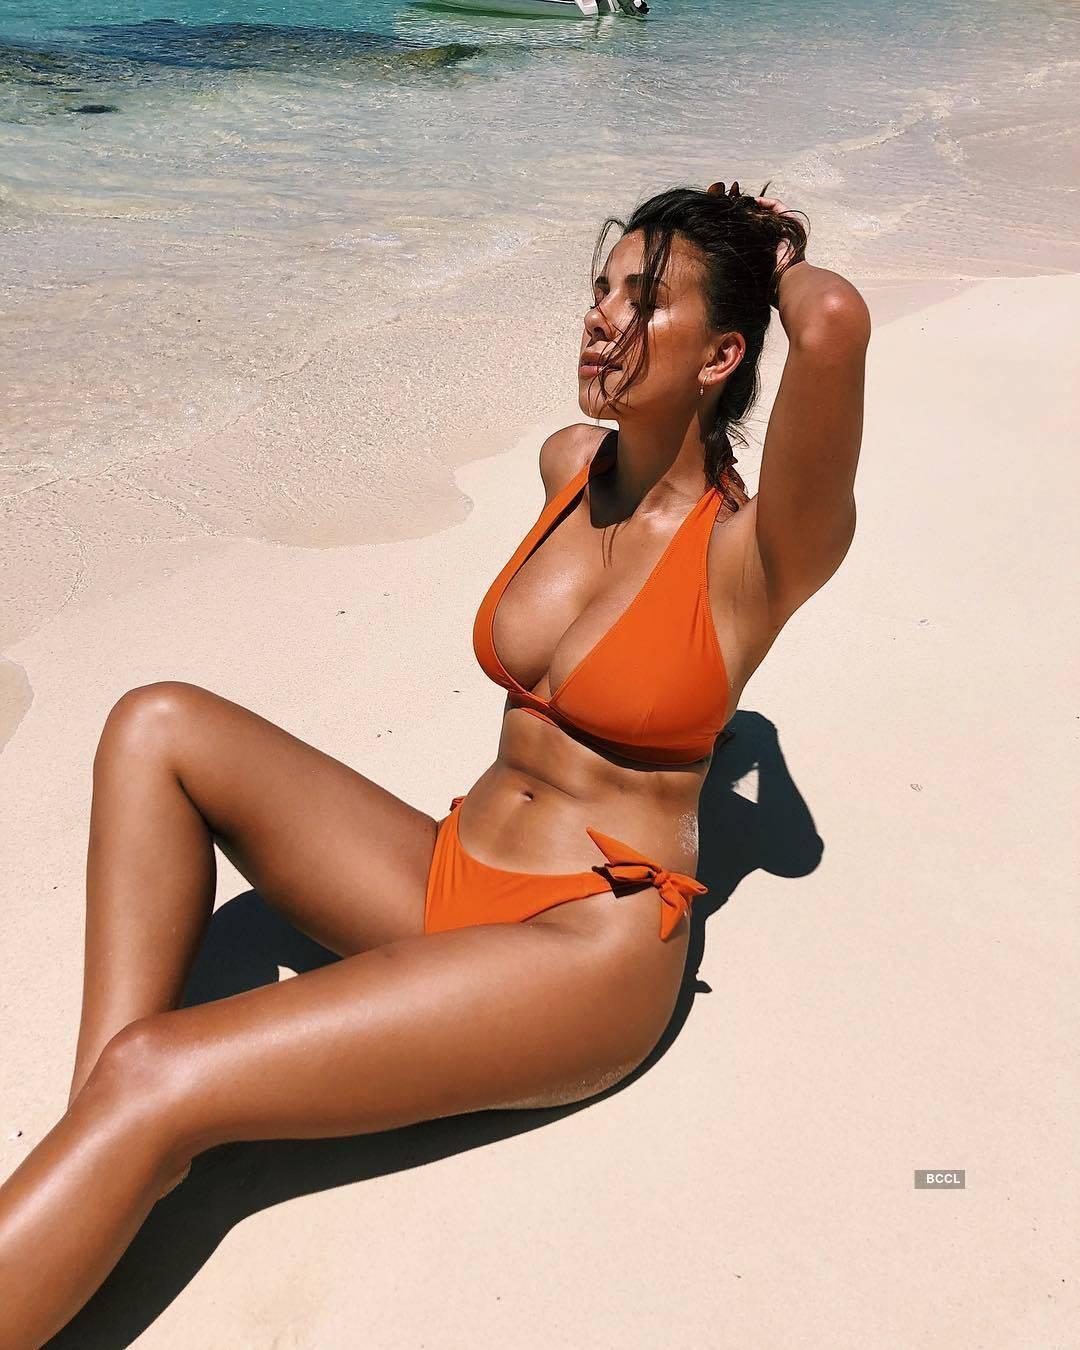 Devin Brugman, the beach babe